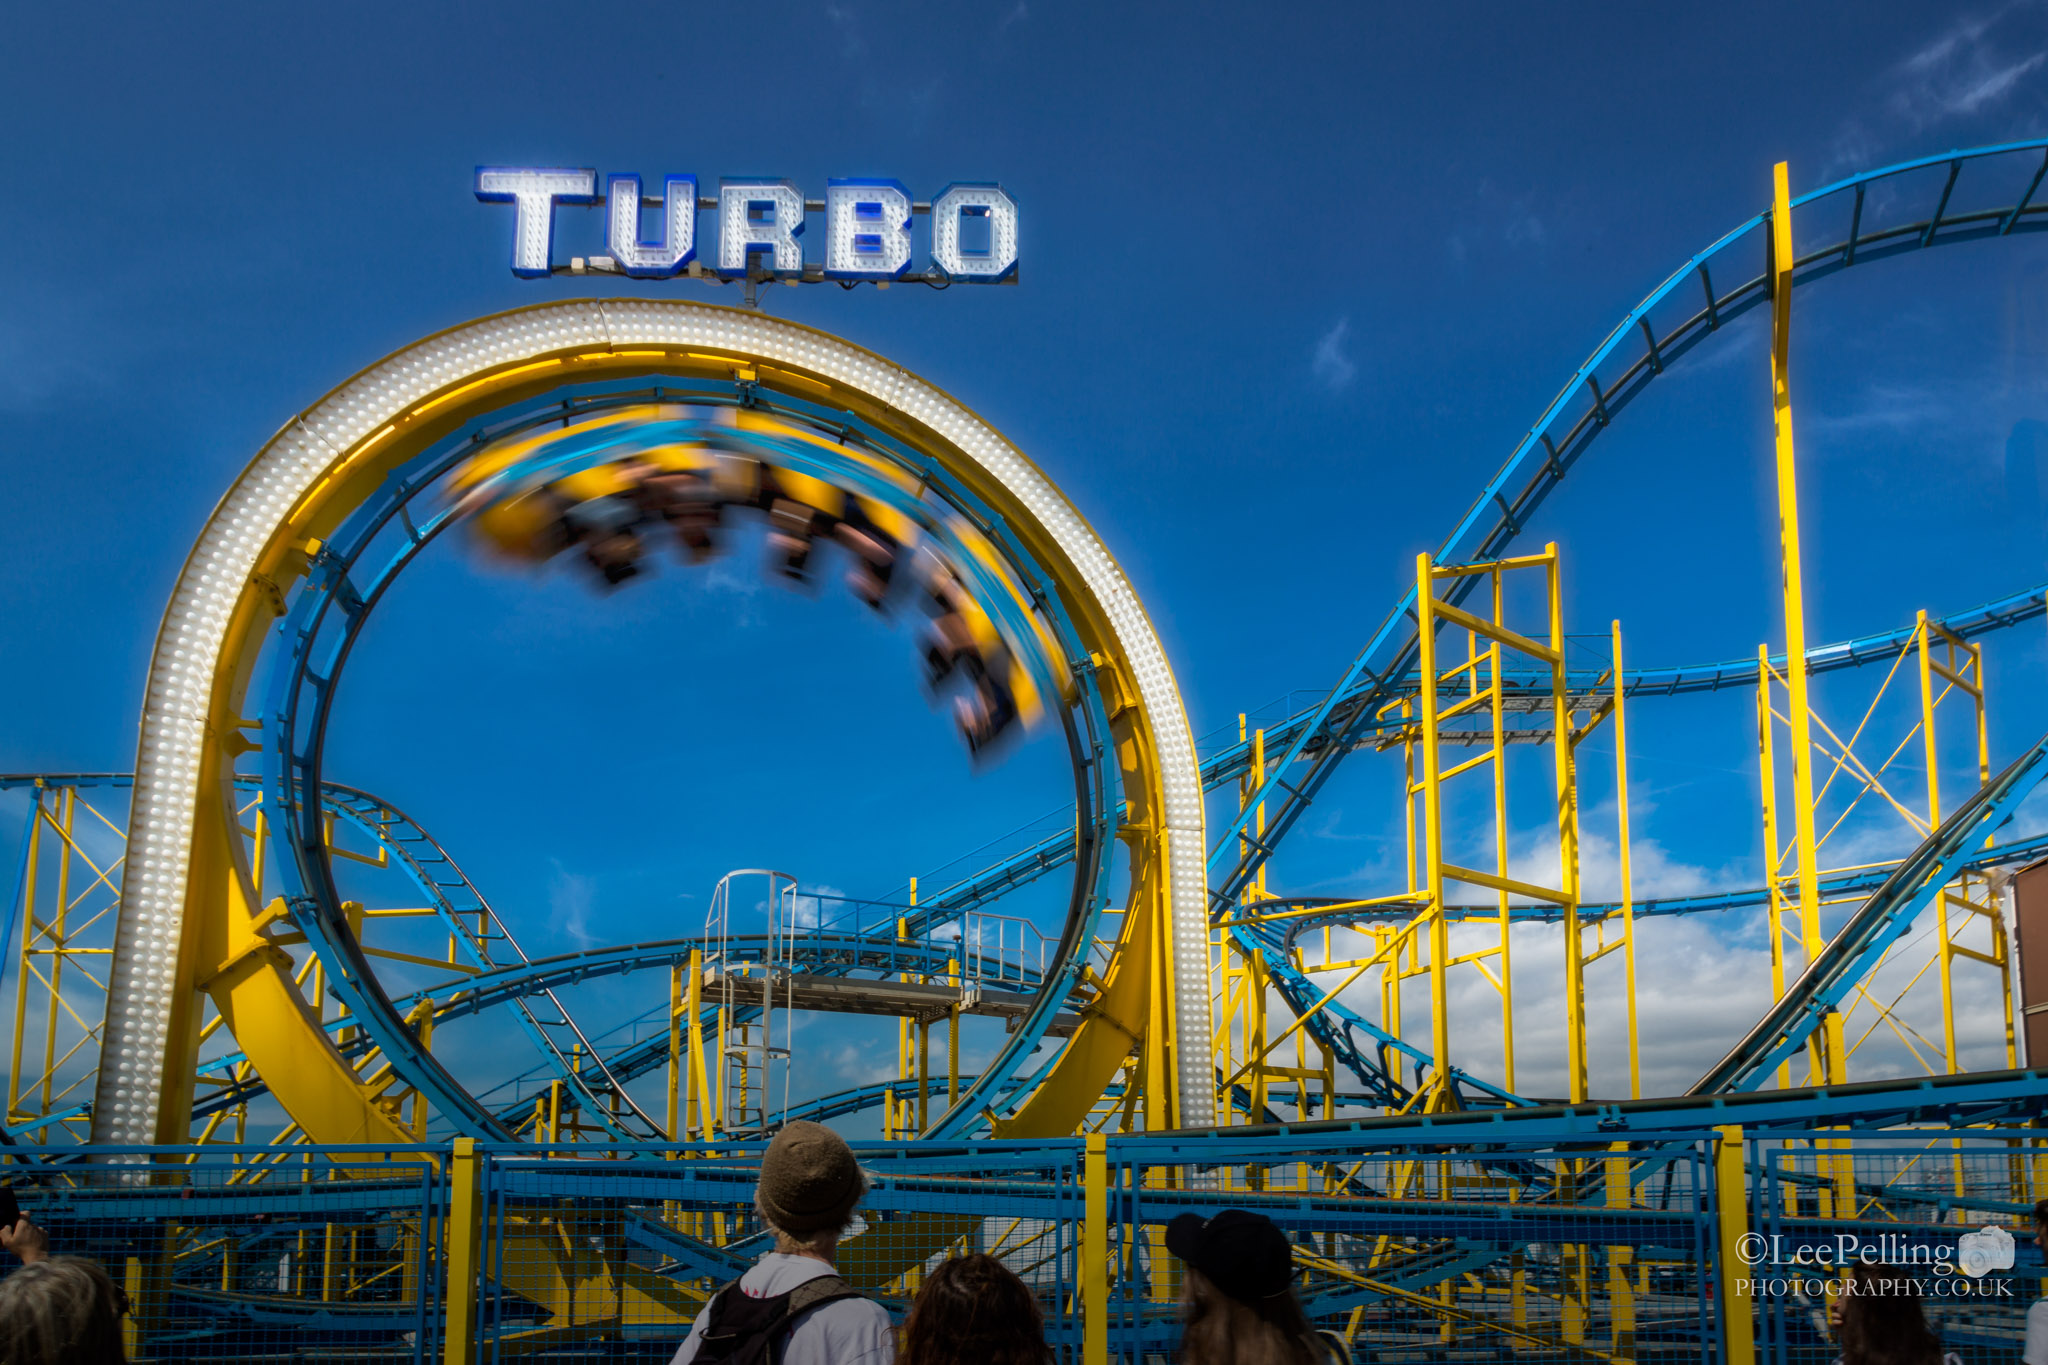 Turbo Roller coaster